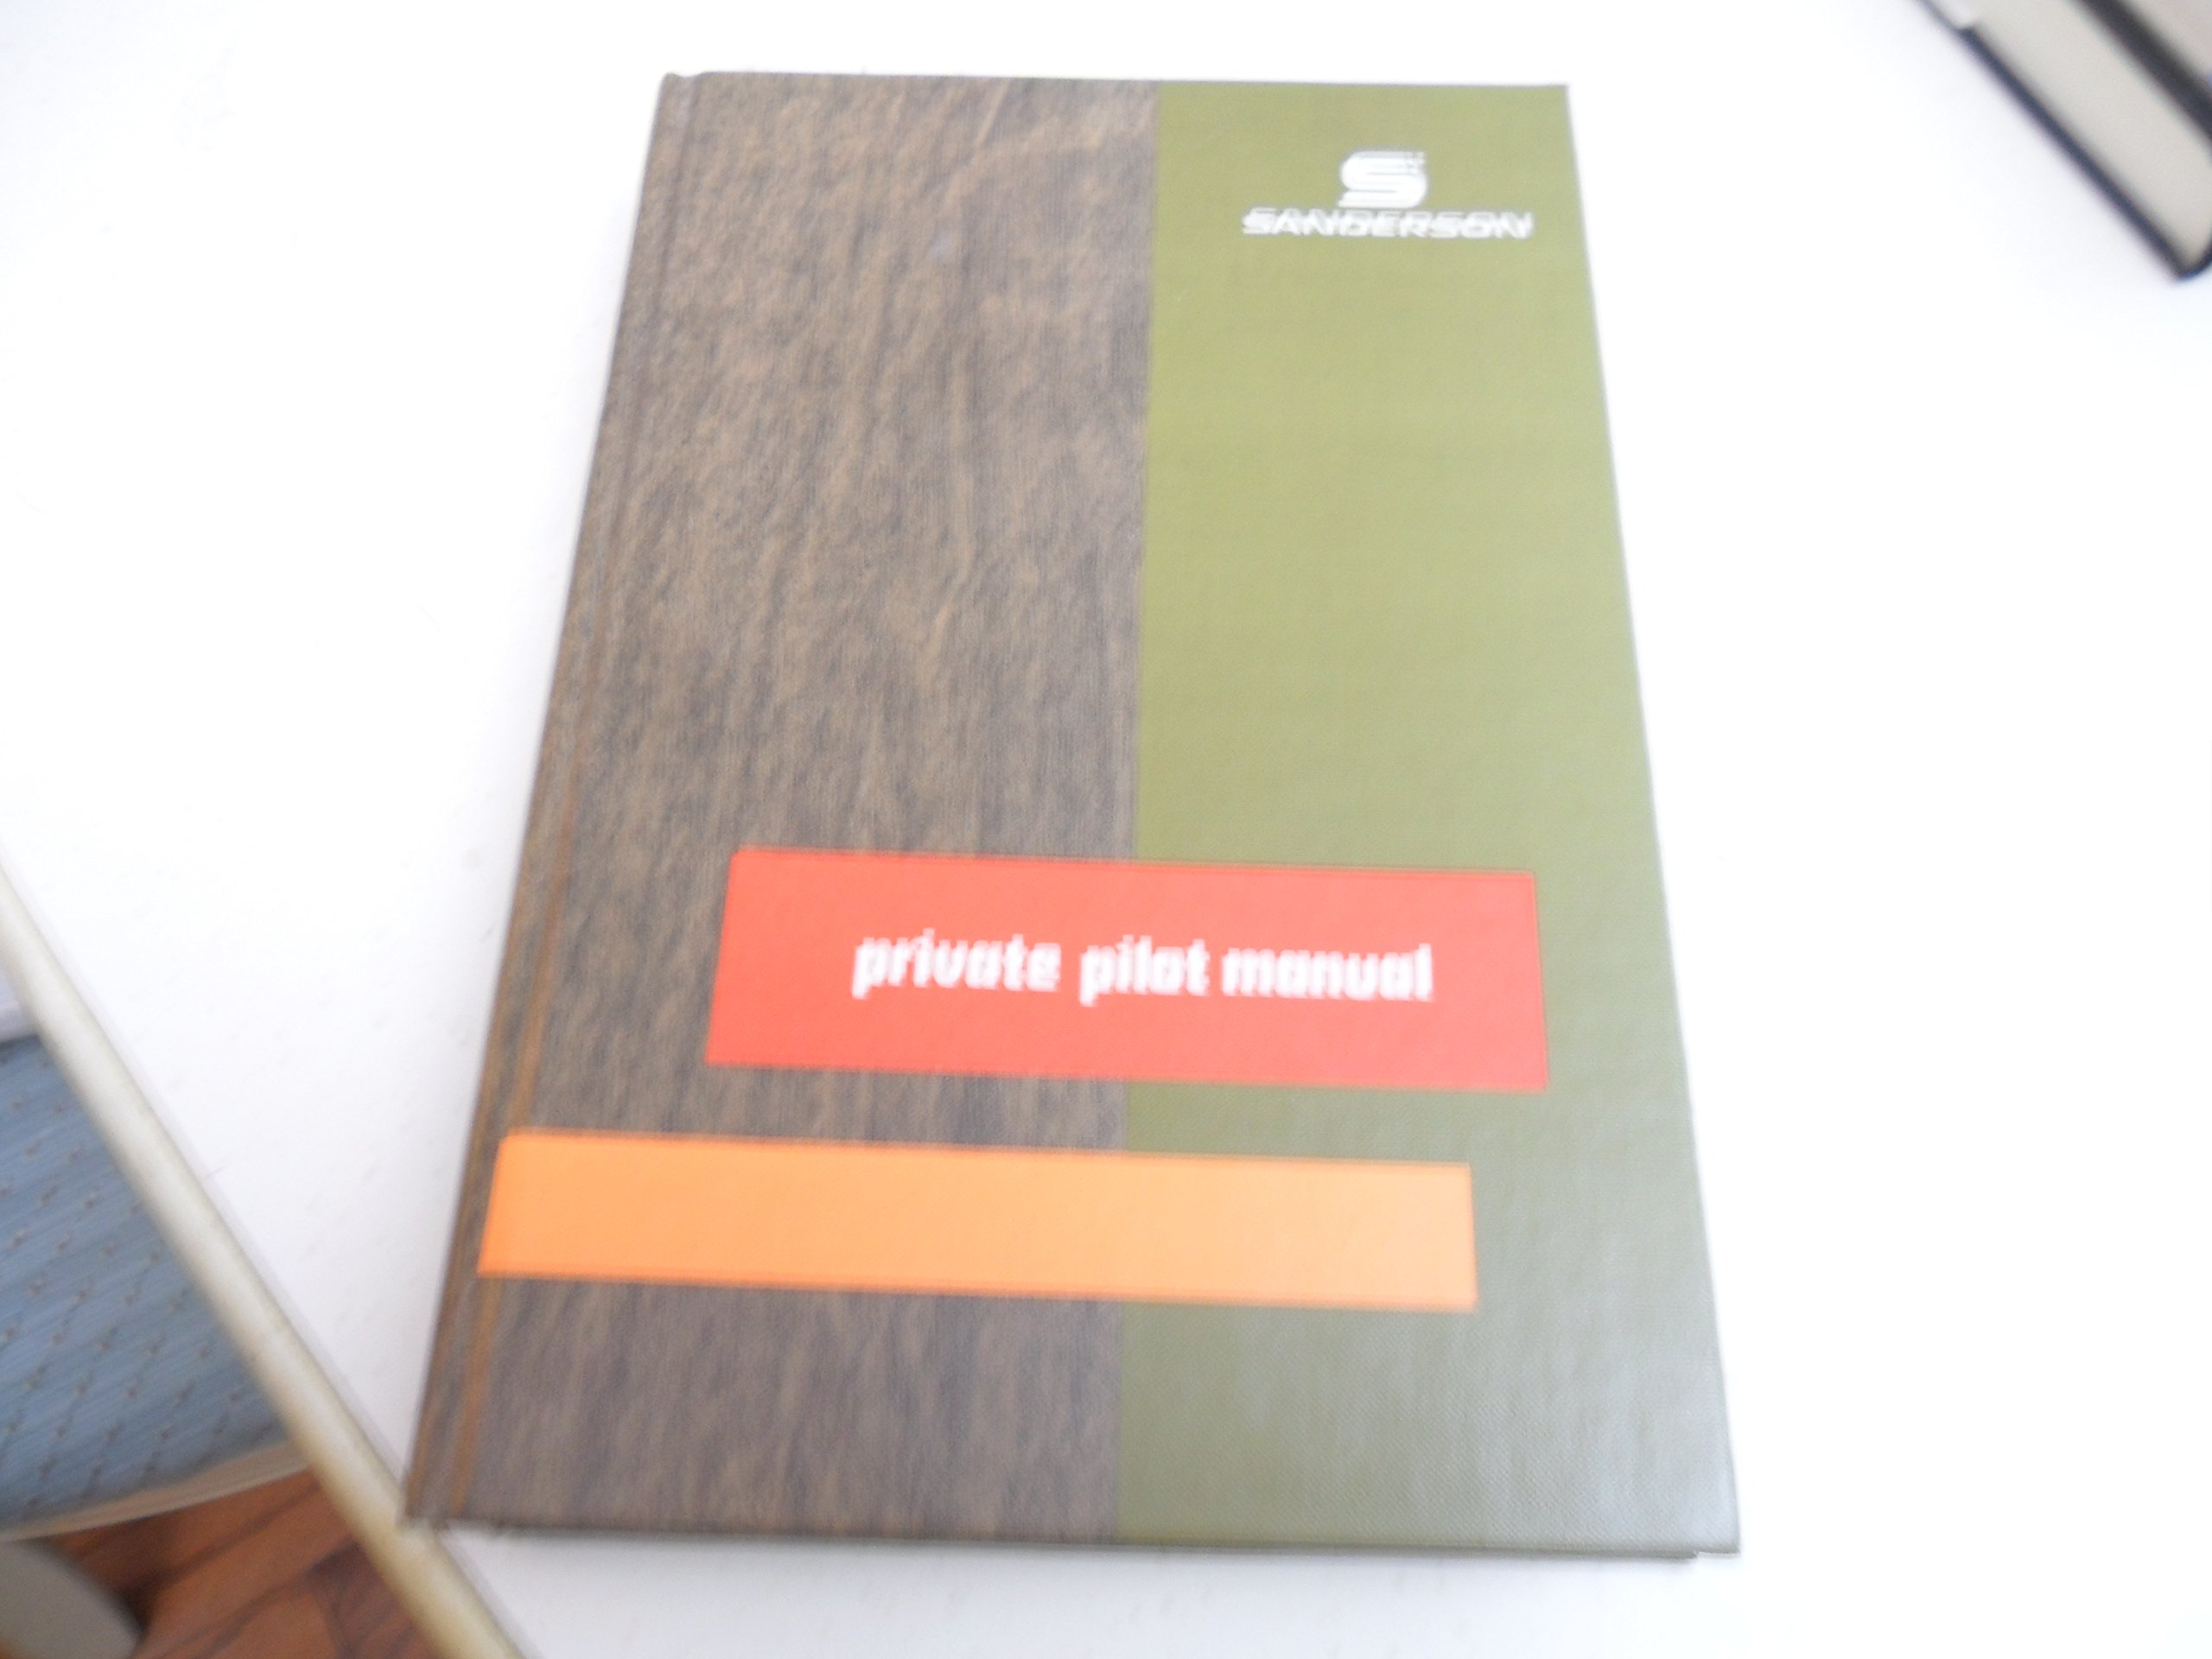 Private Pilot Manual: Jeppesen Sanderson: 9780884870272: Amazon.com: Books